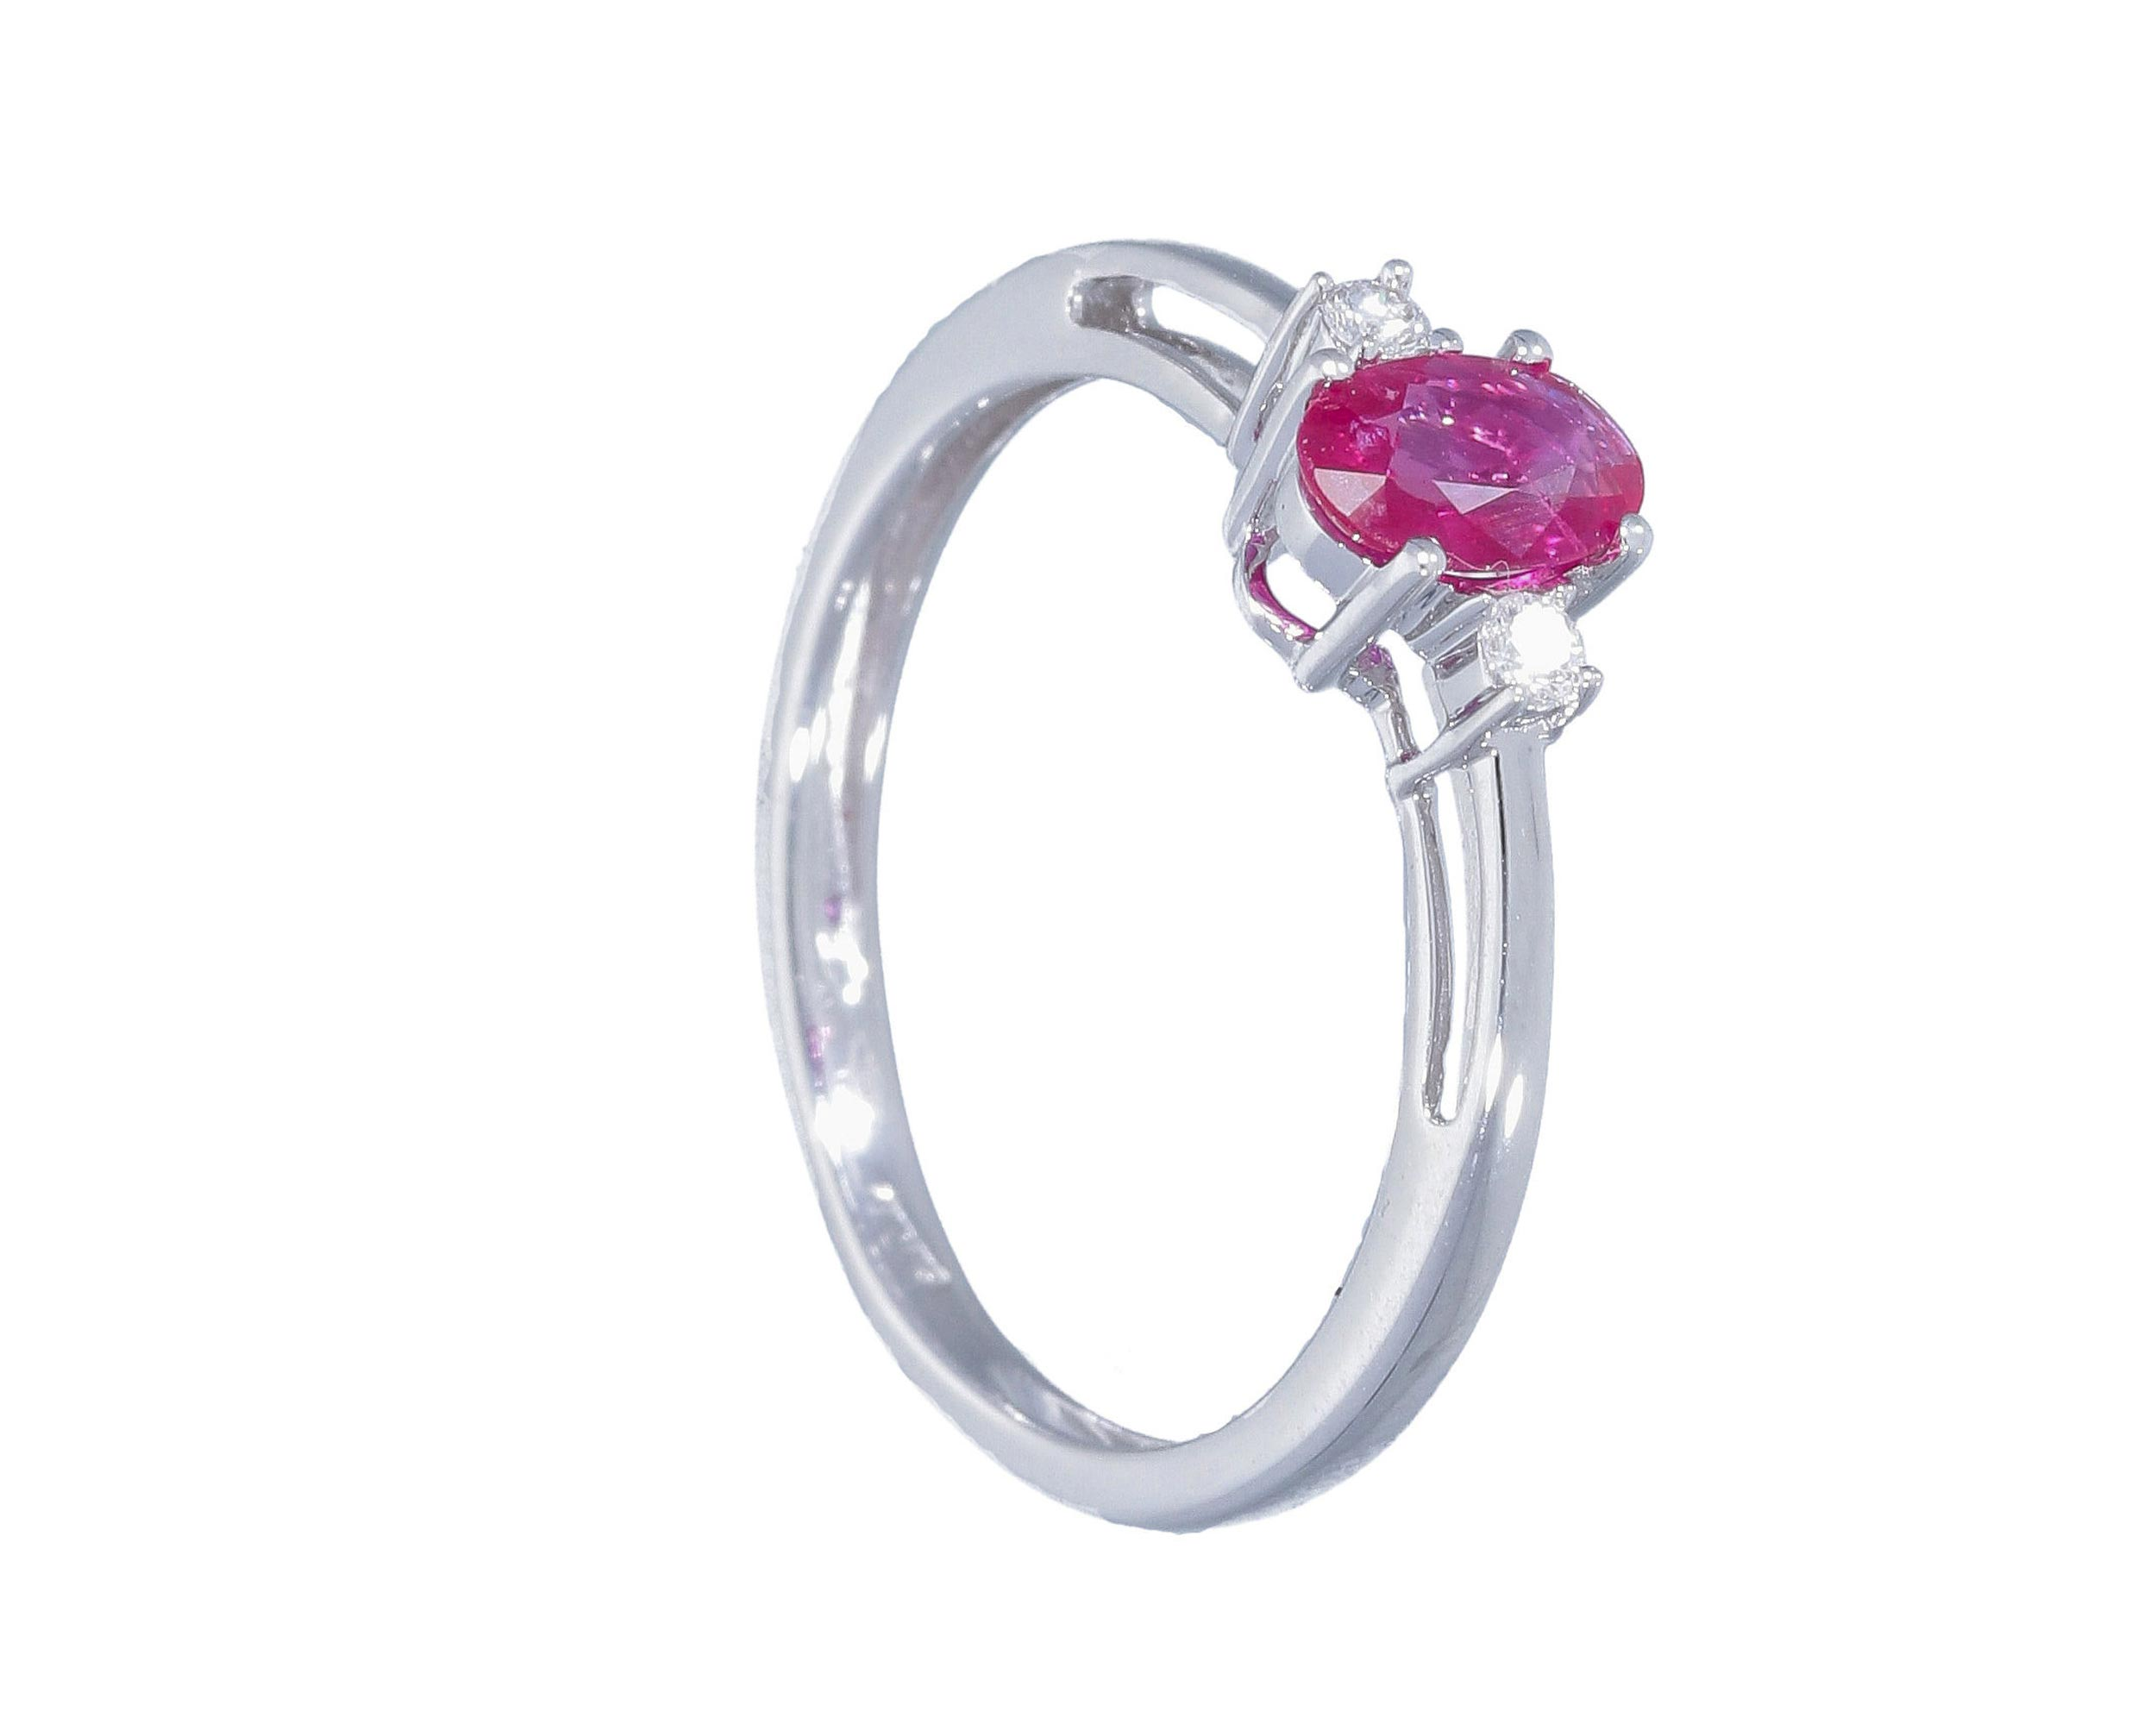 anillo mujer oro rubi diamantes - anillos piedras color rosa - mejores joyerias online españa - joyeria marga mira